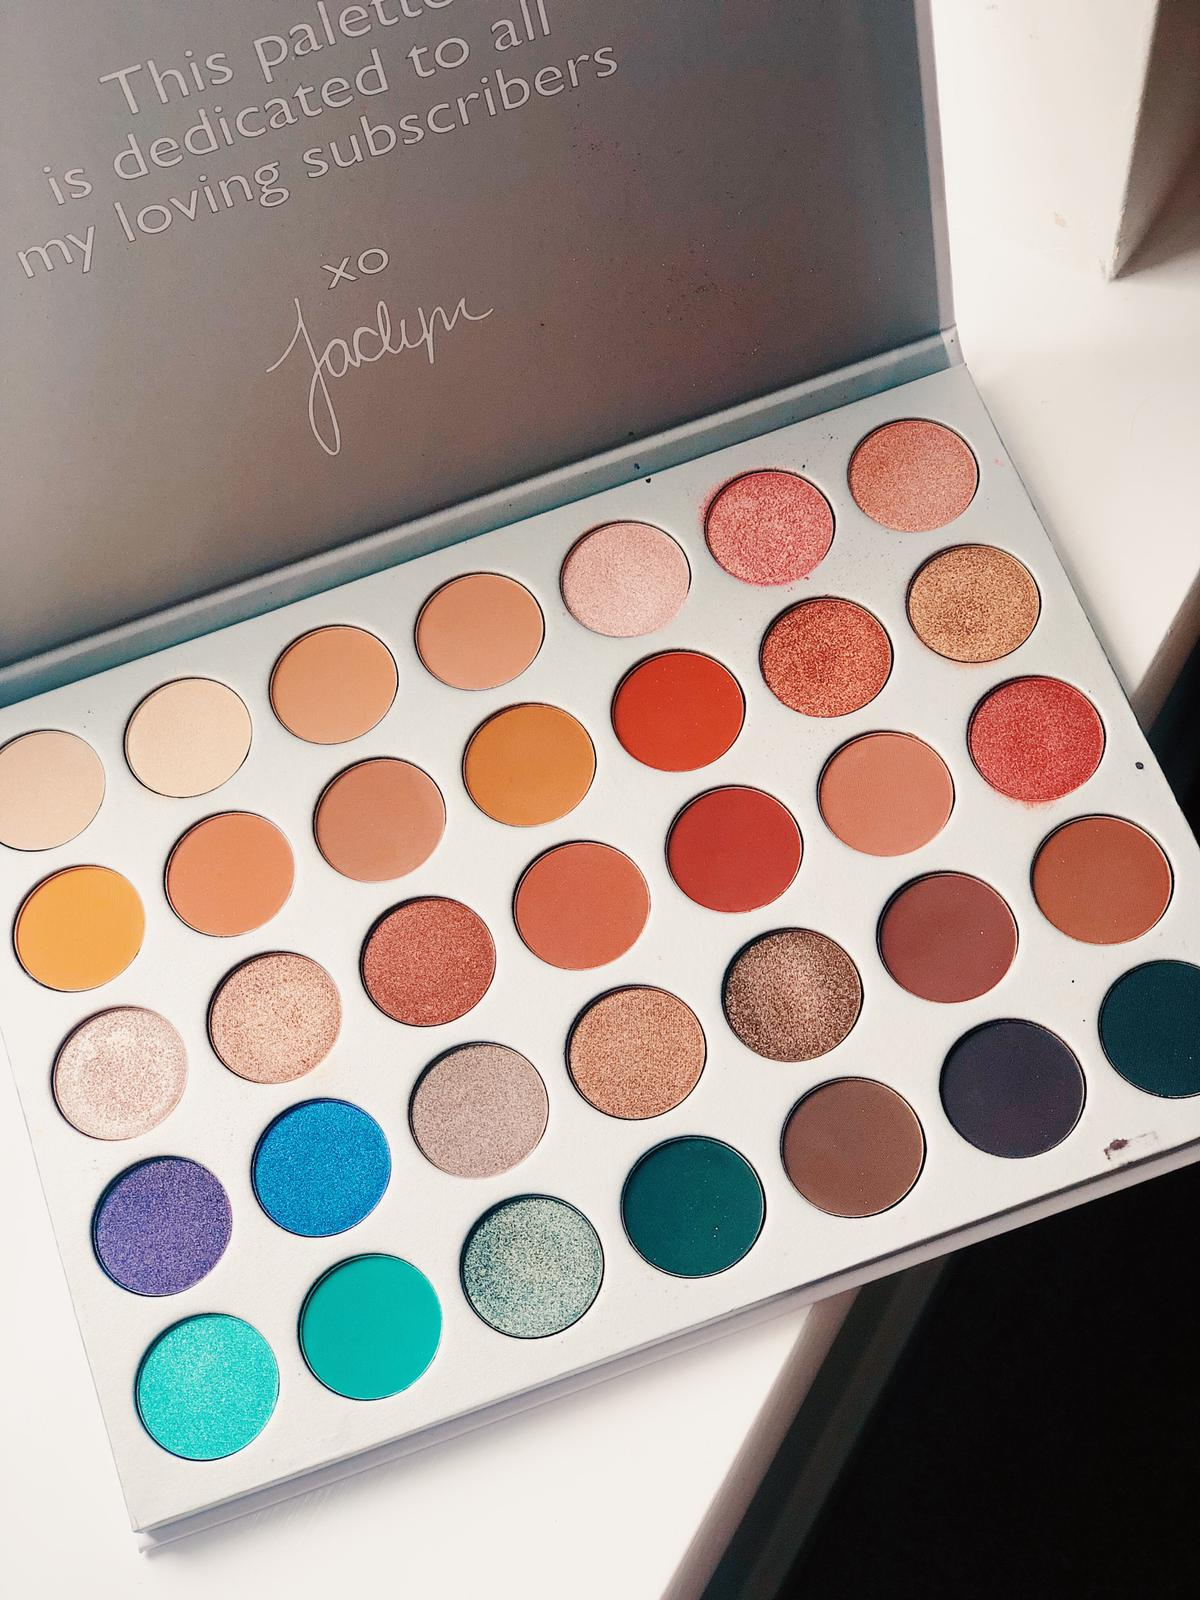 The Morphe Jaclyn Hill palette